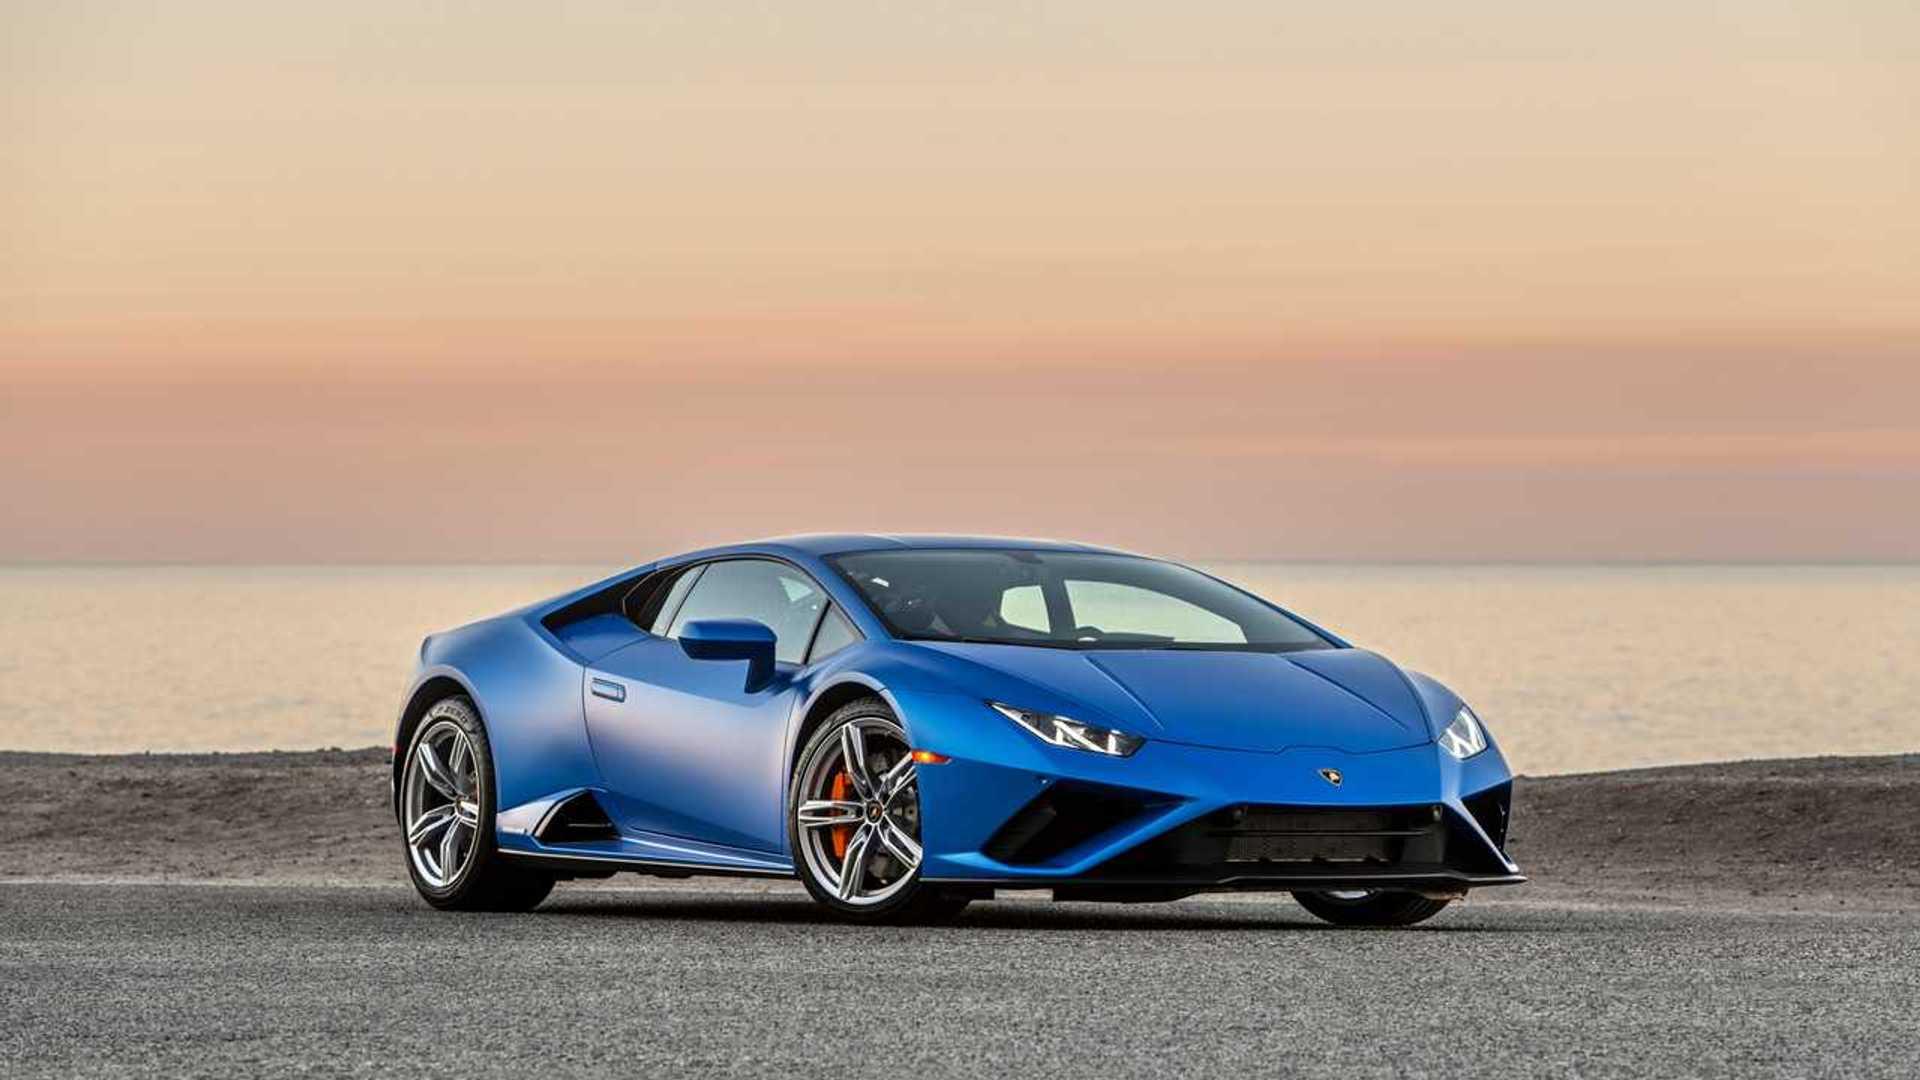 2020 Lamborghini Huracan Evo RWD front quarter static